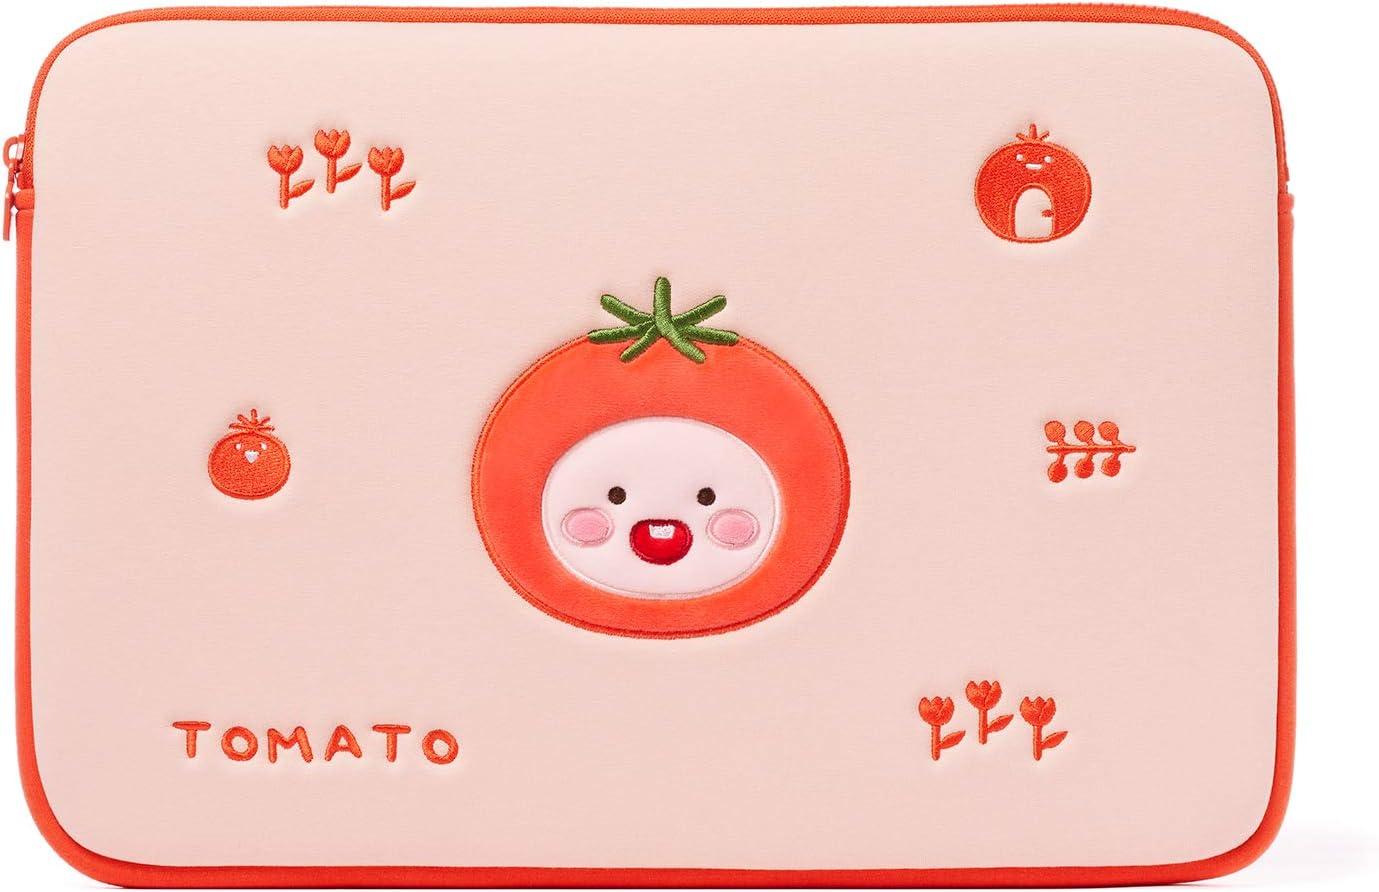 KAKAO FRIENDS Official- YumYum Friends 15 Inch Protective Laptop Sleeve Pouch (Little Apeach)